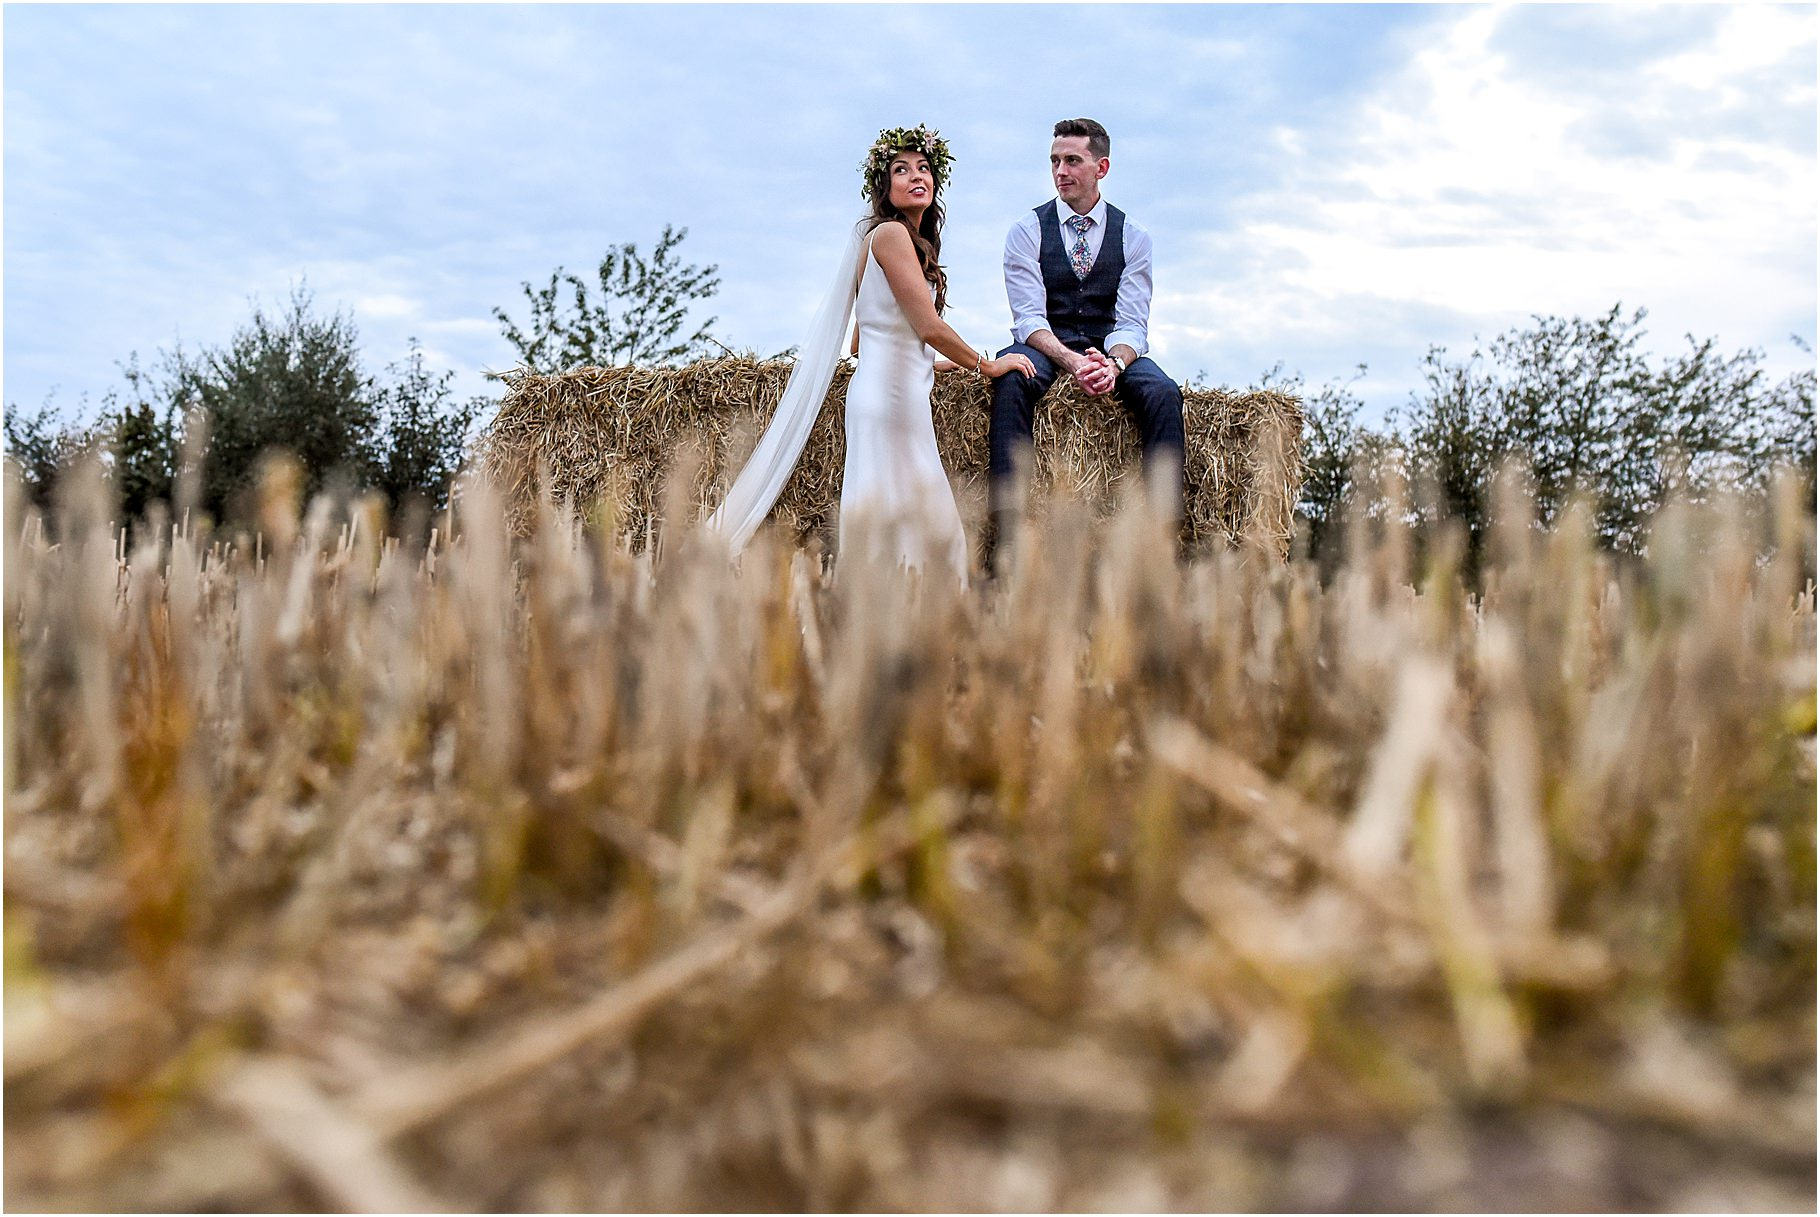 dan-wootton-photography-2017-weddings-120.jpg